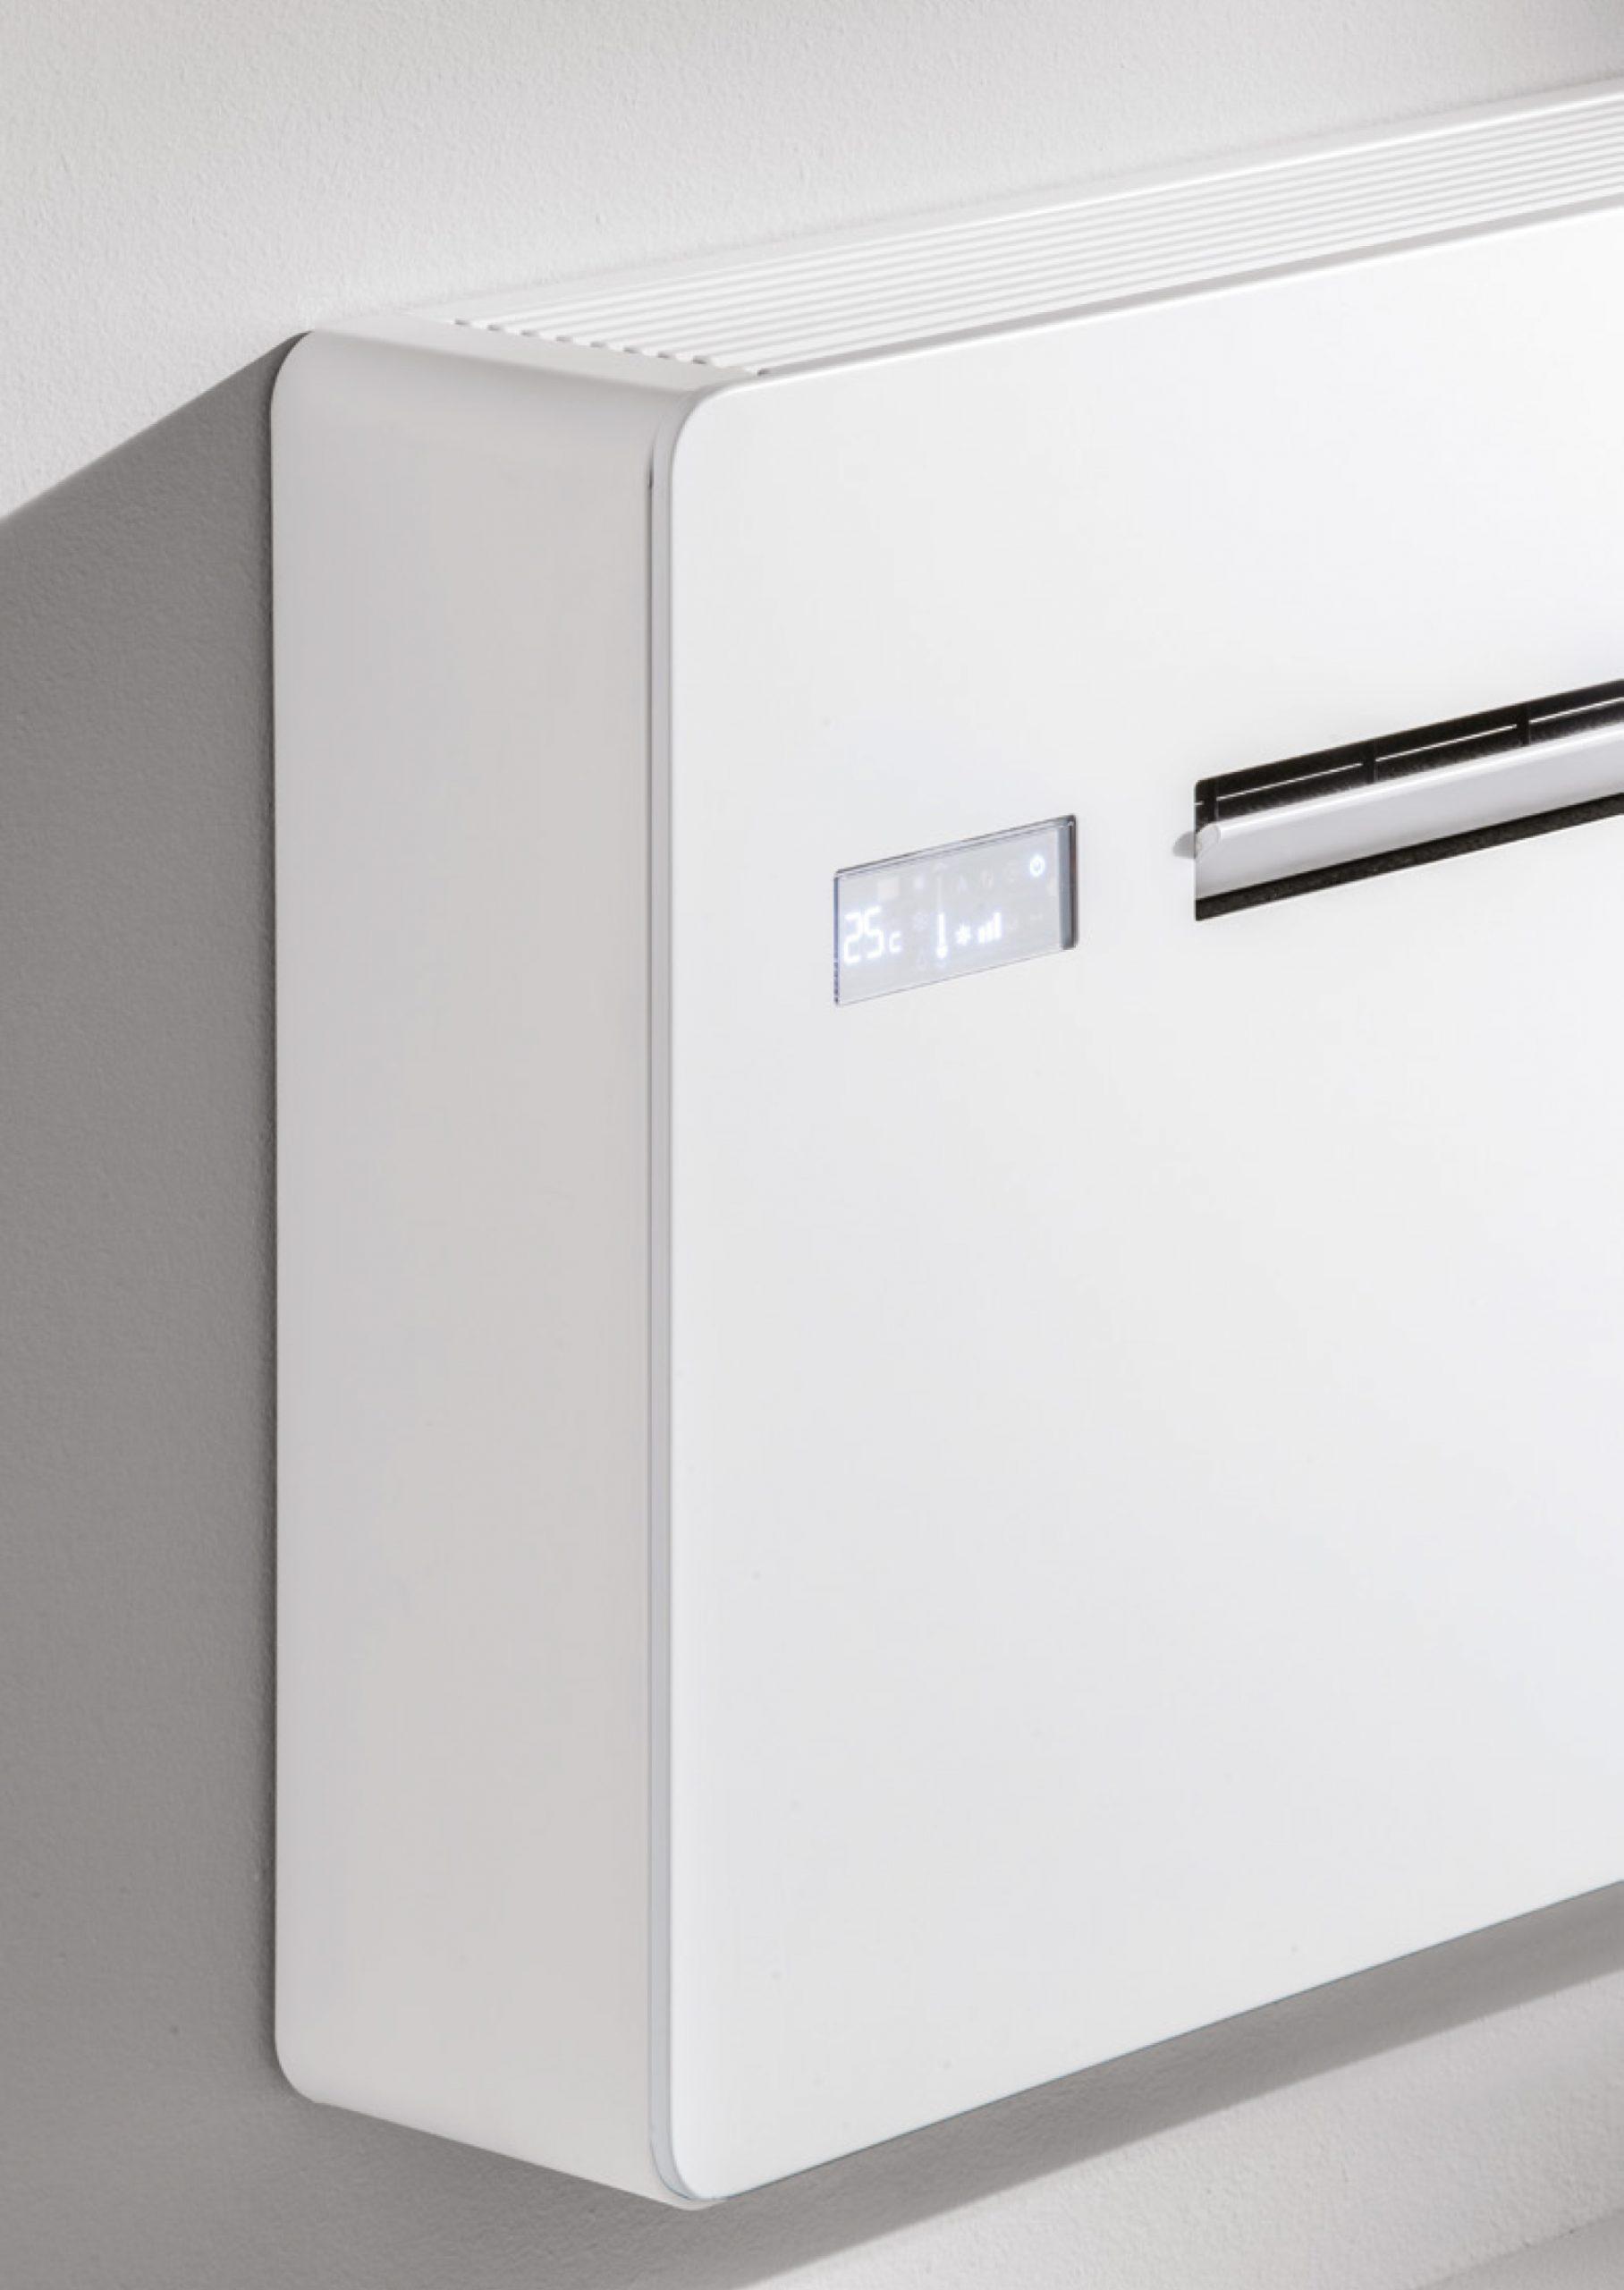 Aircoheater kopen